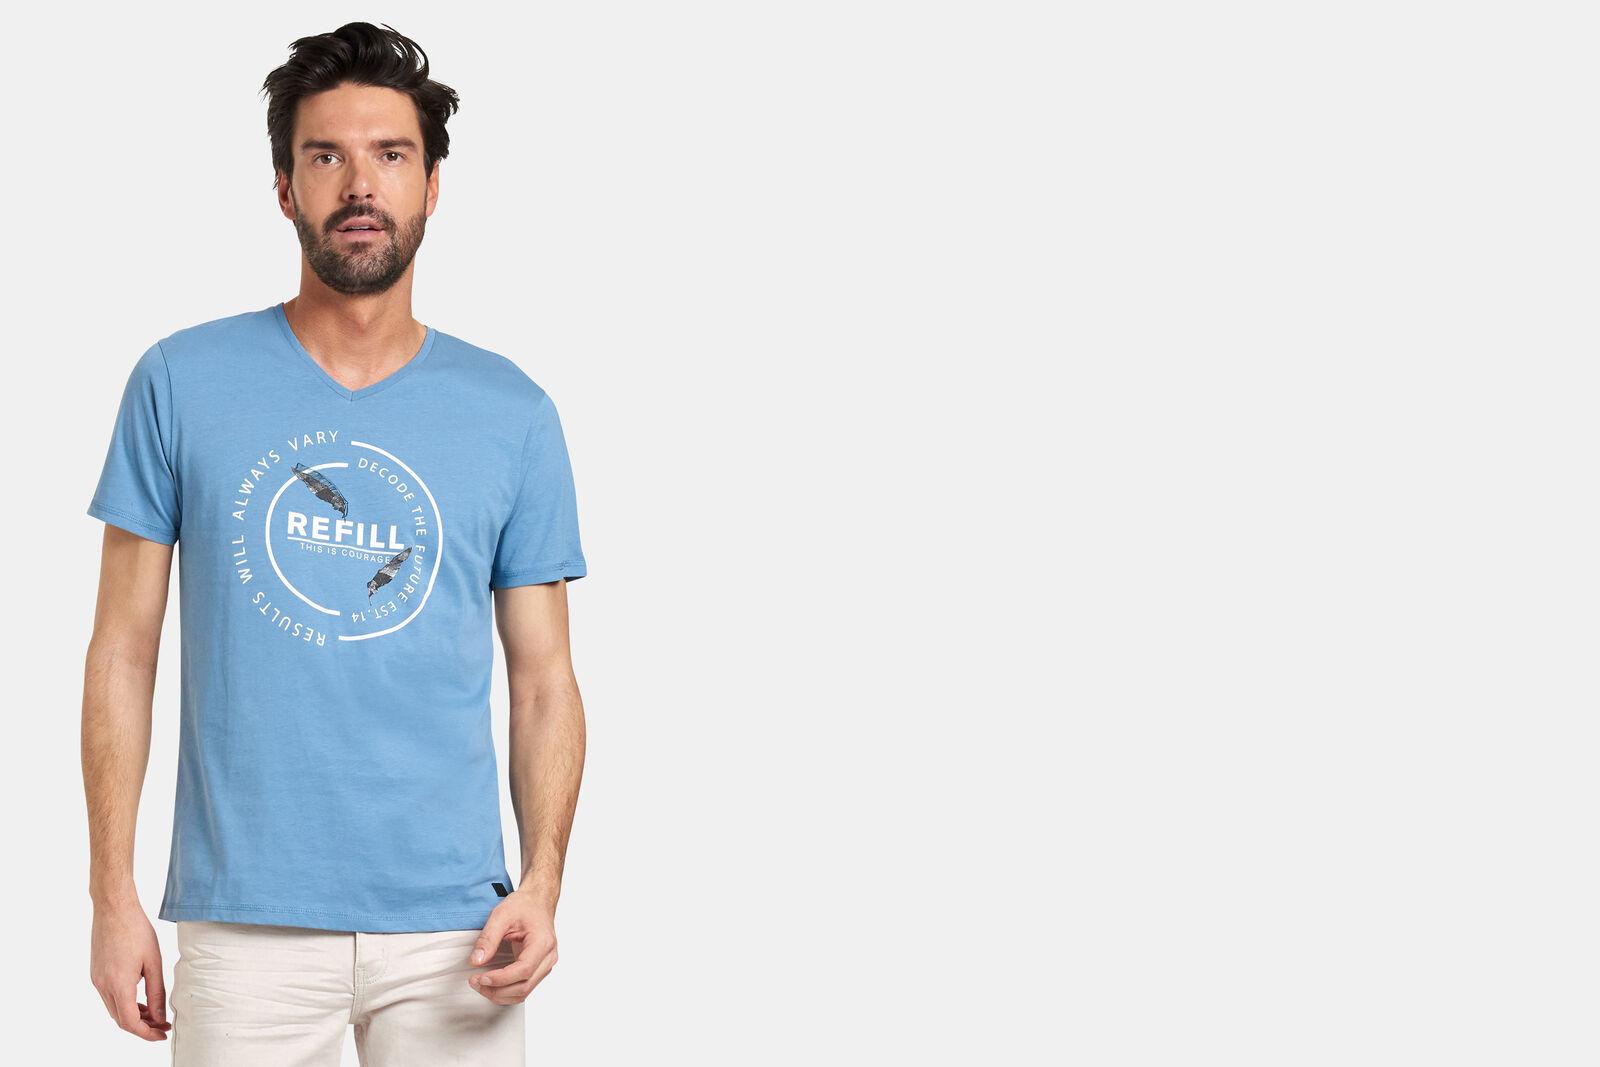 Talha T-shirt